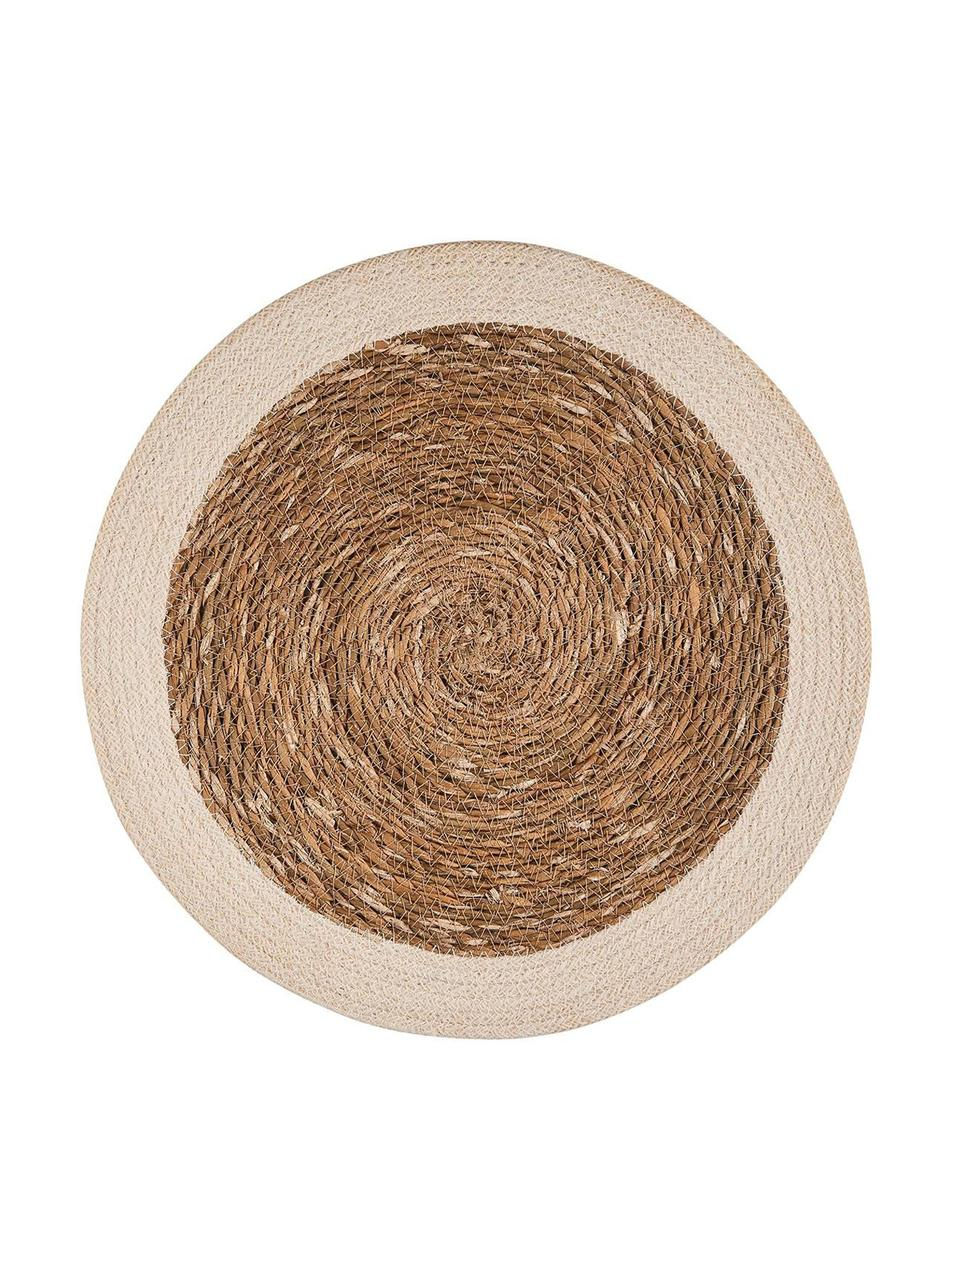 Tovaglietta americana rotonda Sauvage 2 pz, Alghe, iuta, Beige, bianco, Ø 38 cm